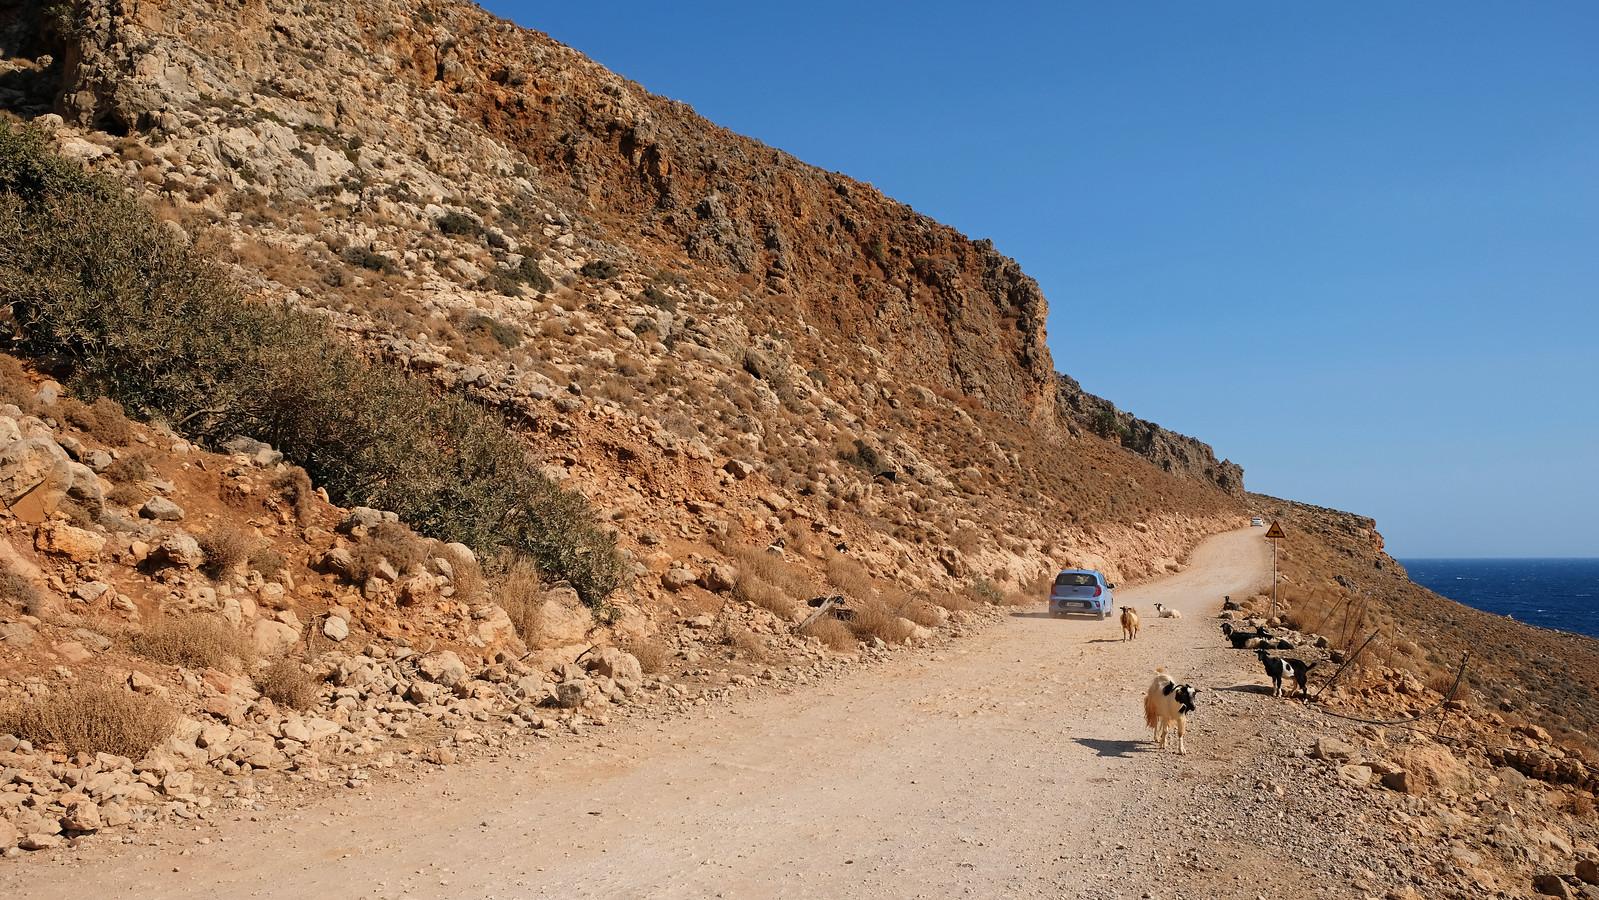 On the way to Balos Beach, Crete, Greece